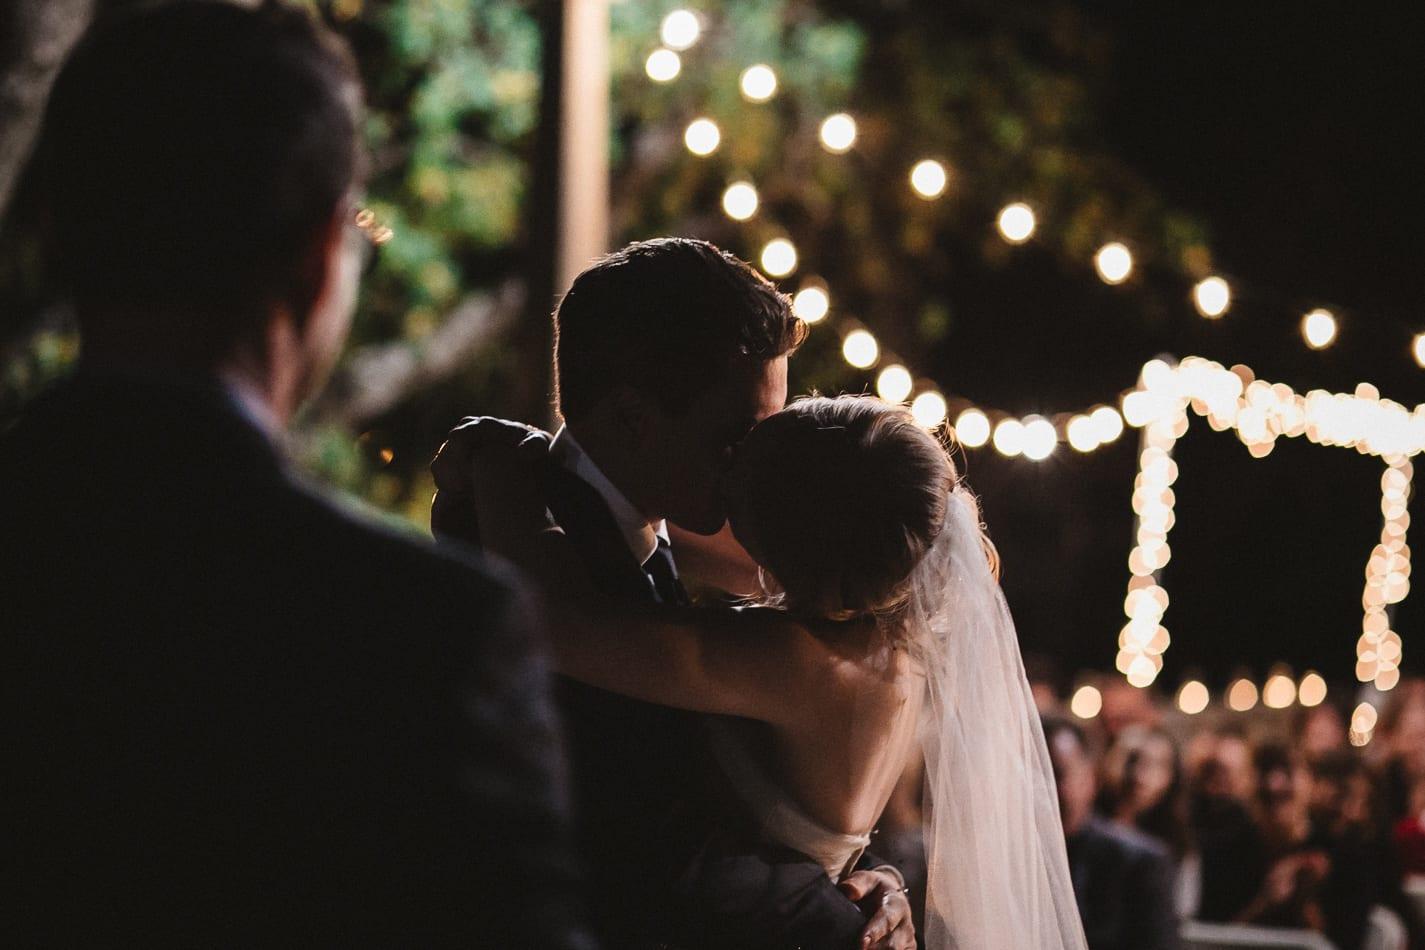 lake-redding-park-diesel-horse-bridge-view202-california-wedding-photographer-23